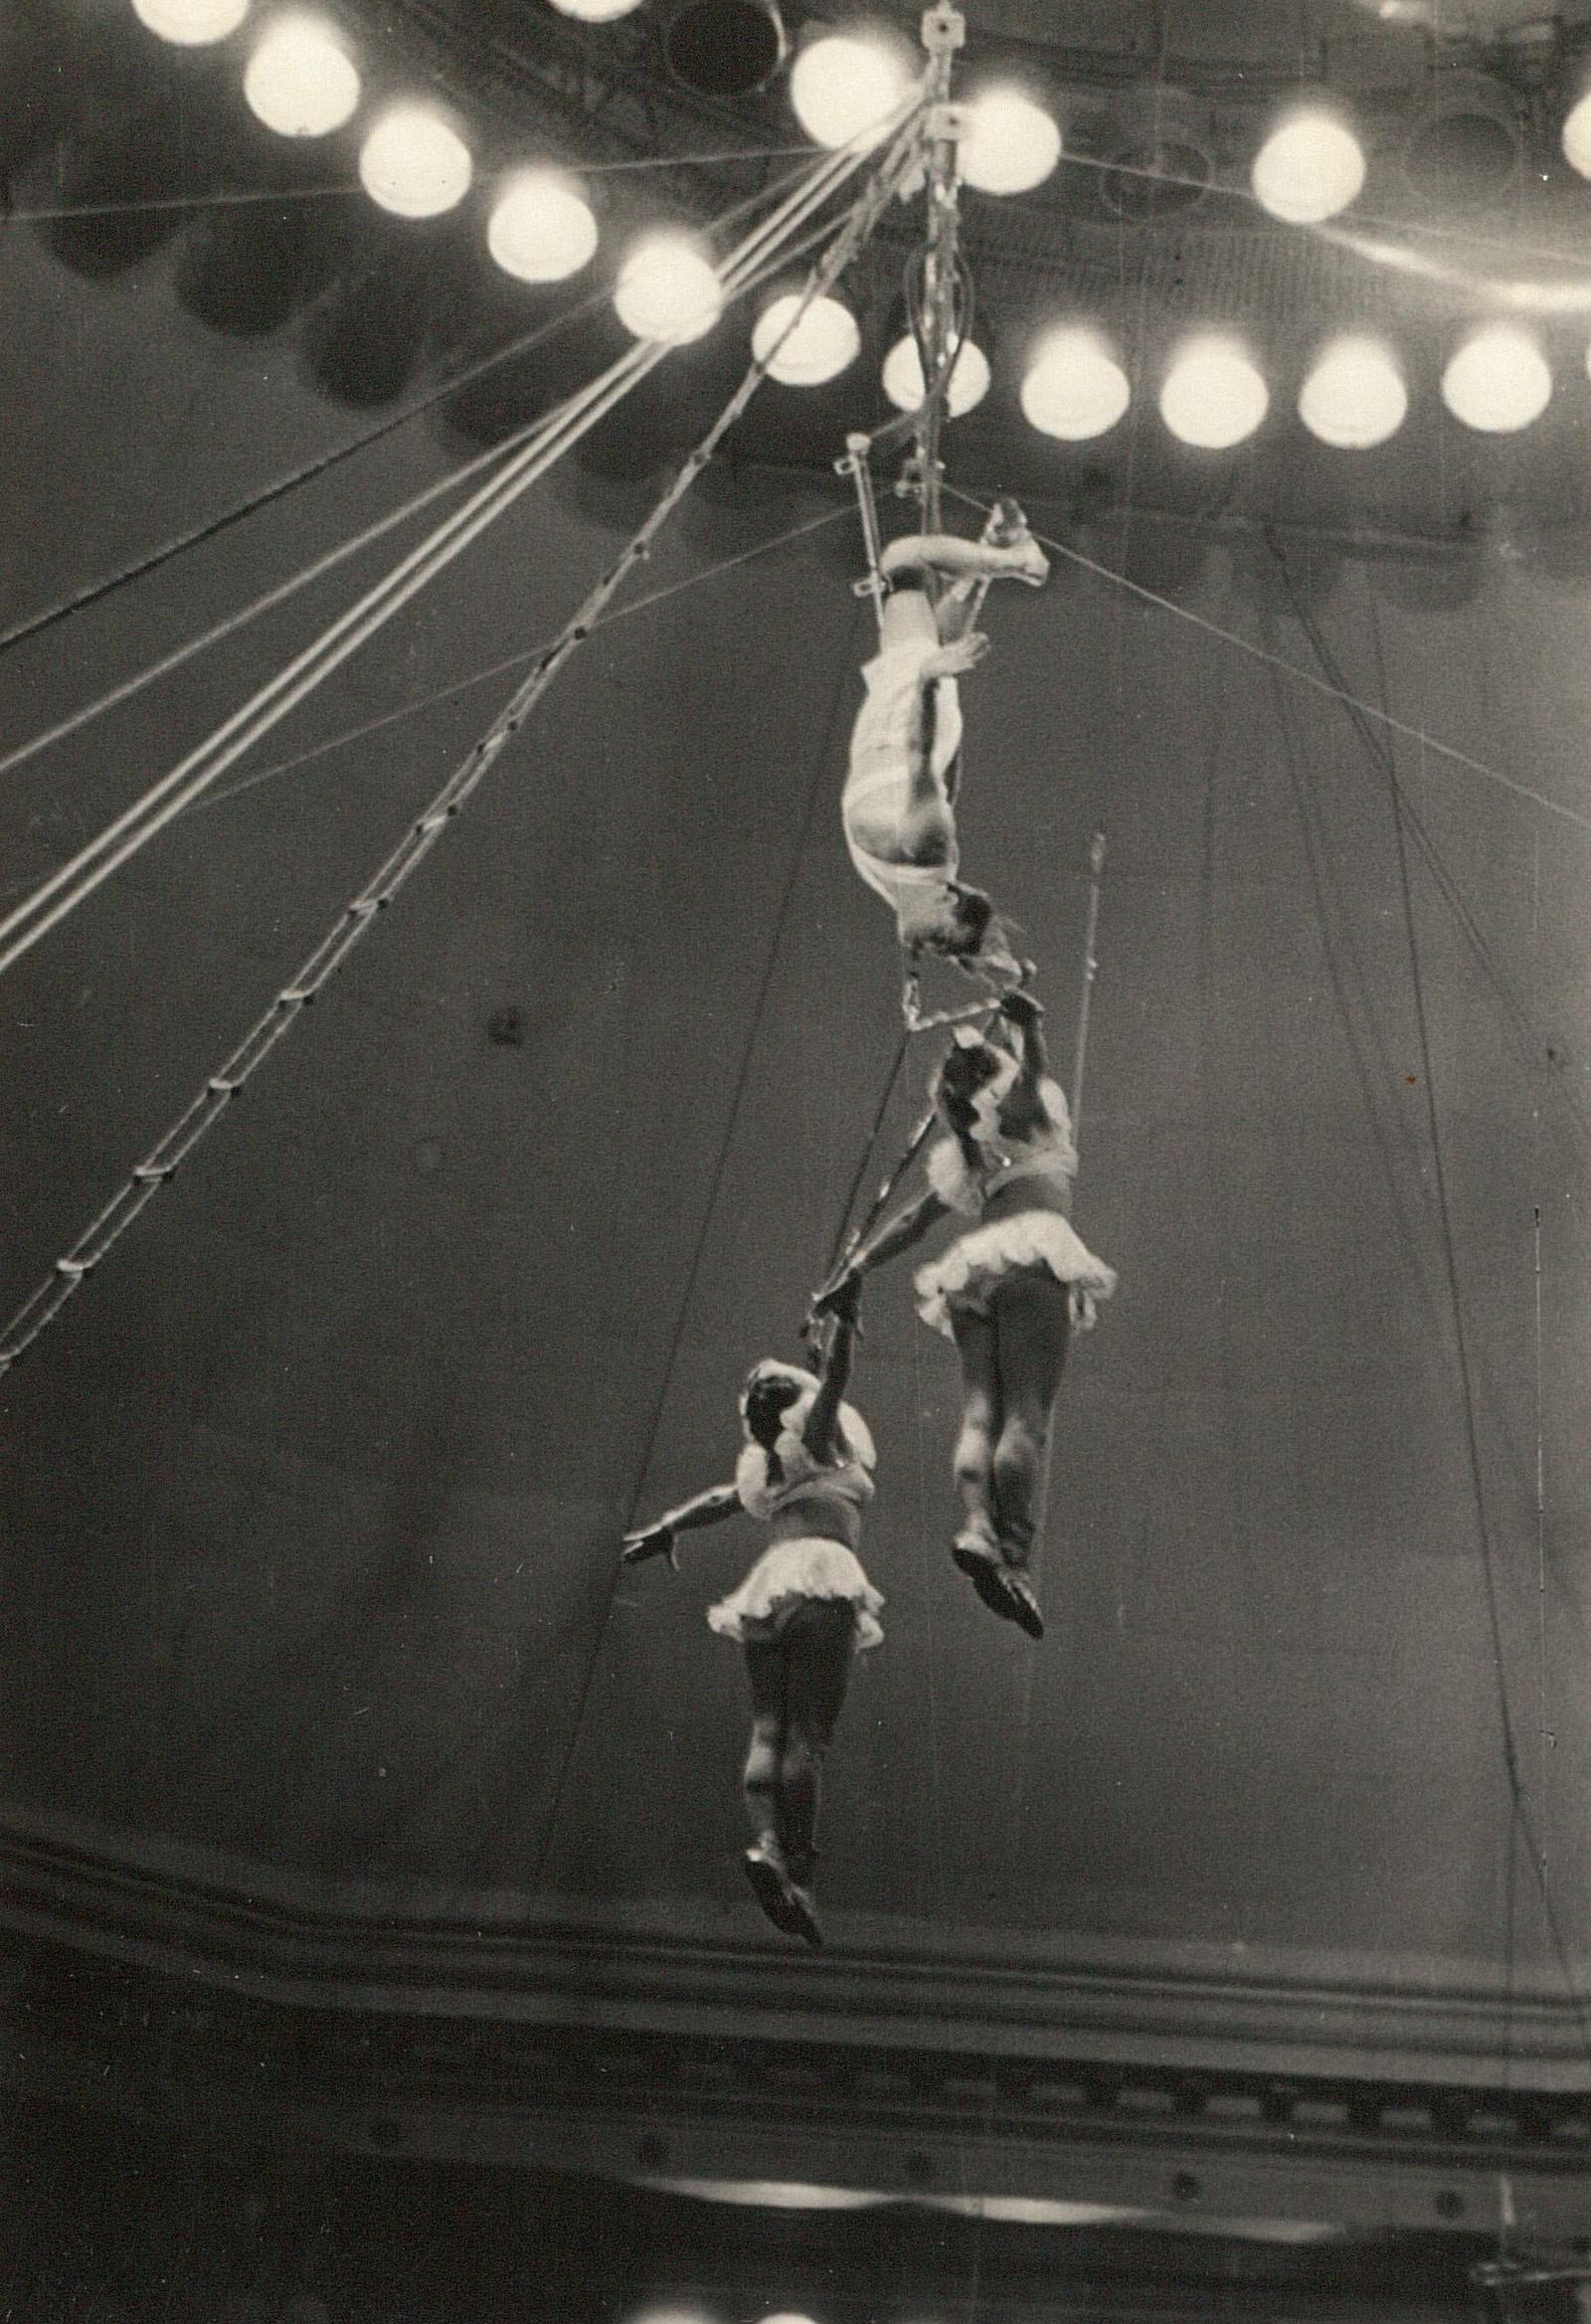 Цирк. Акробаты на трапеции